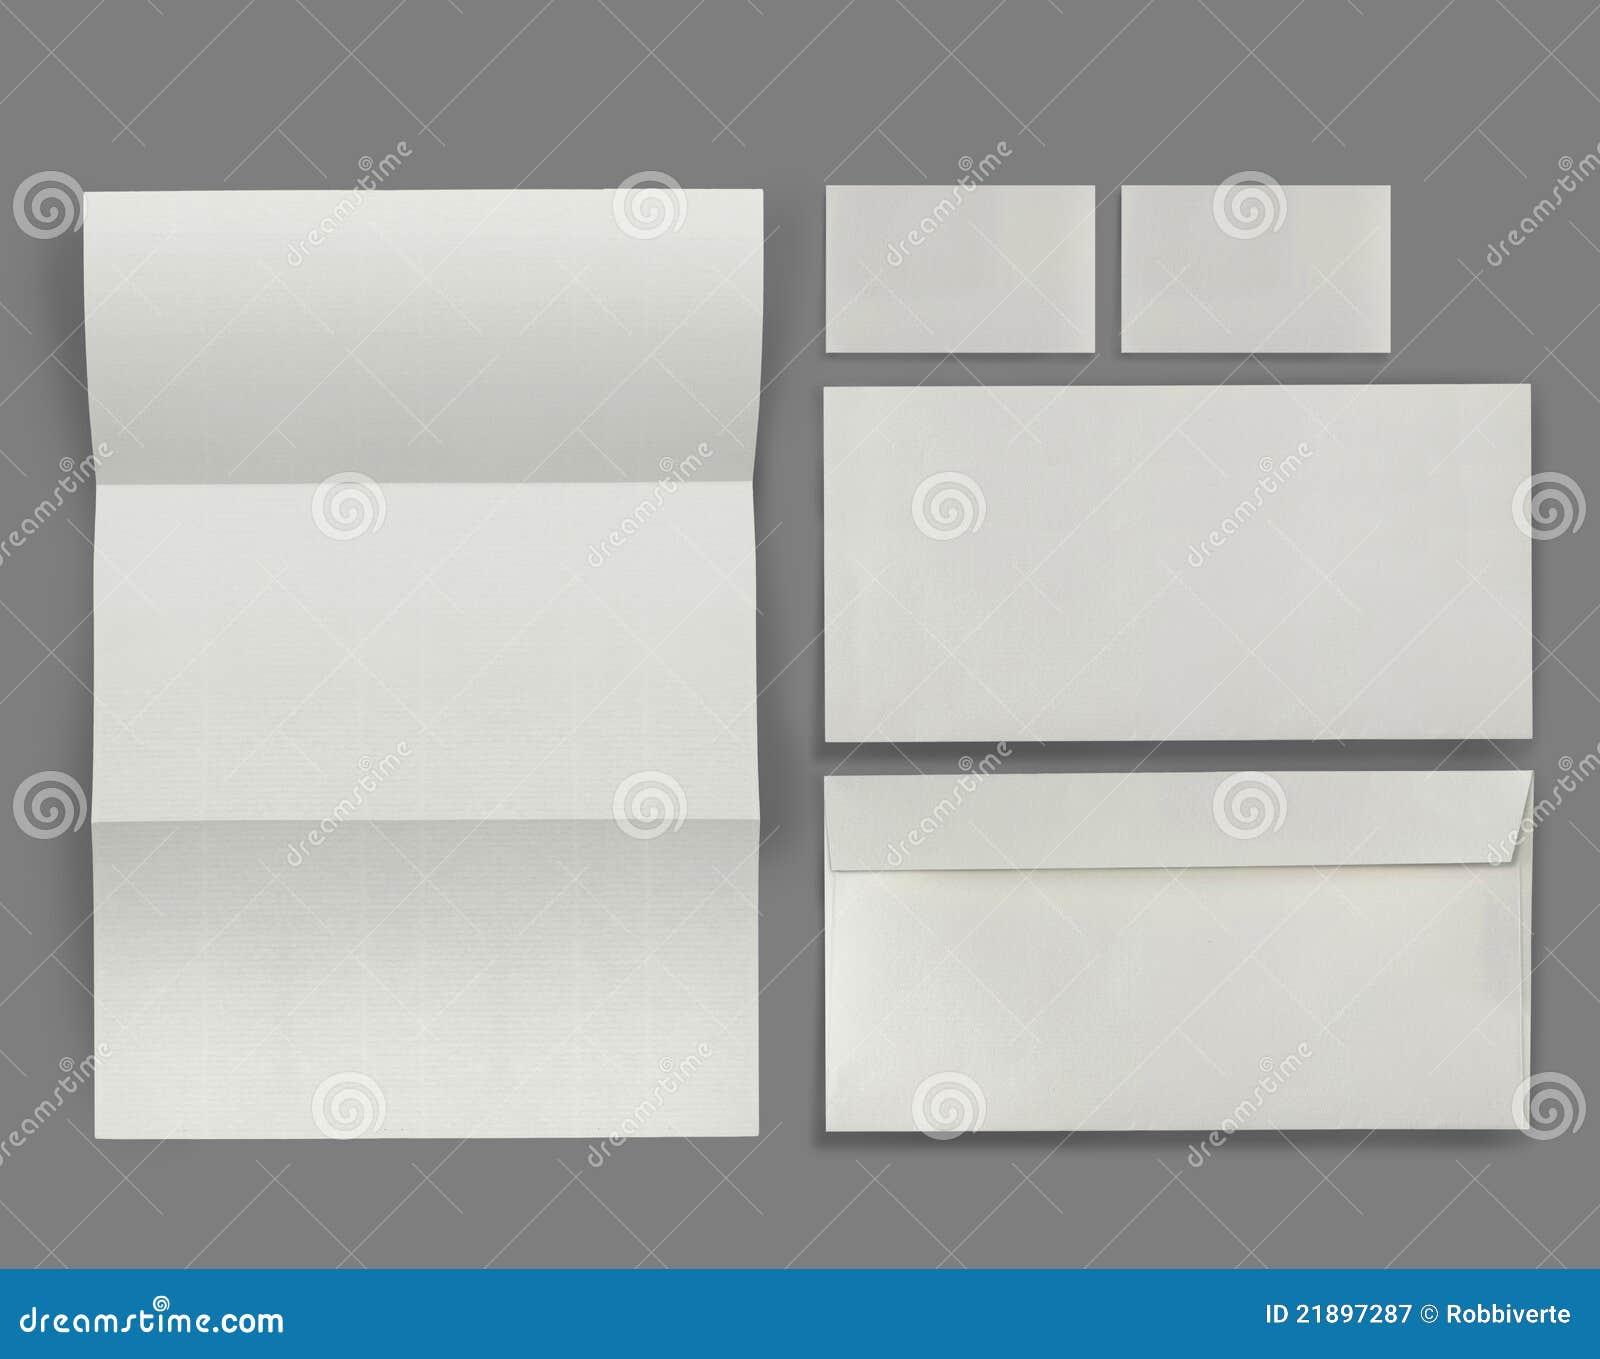 set of corporate identity template stock illustration, Powerpoint templates